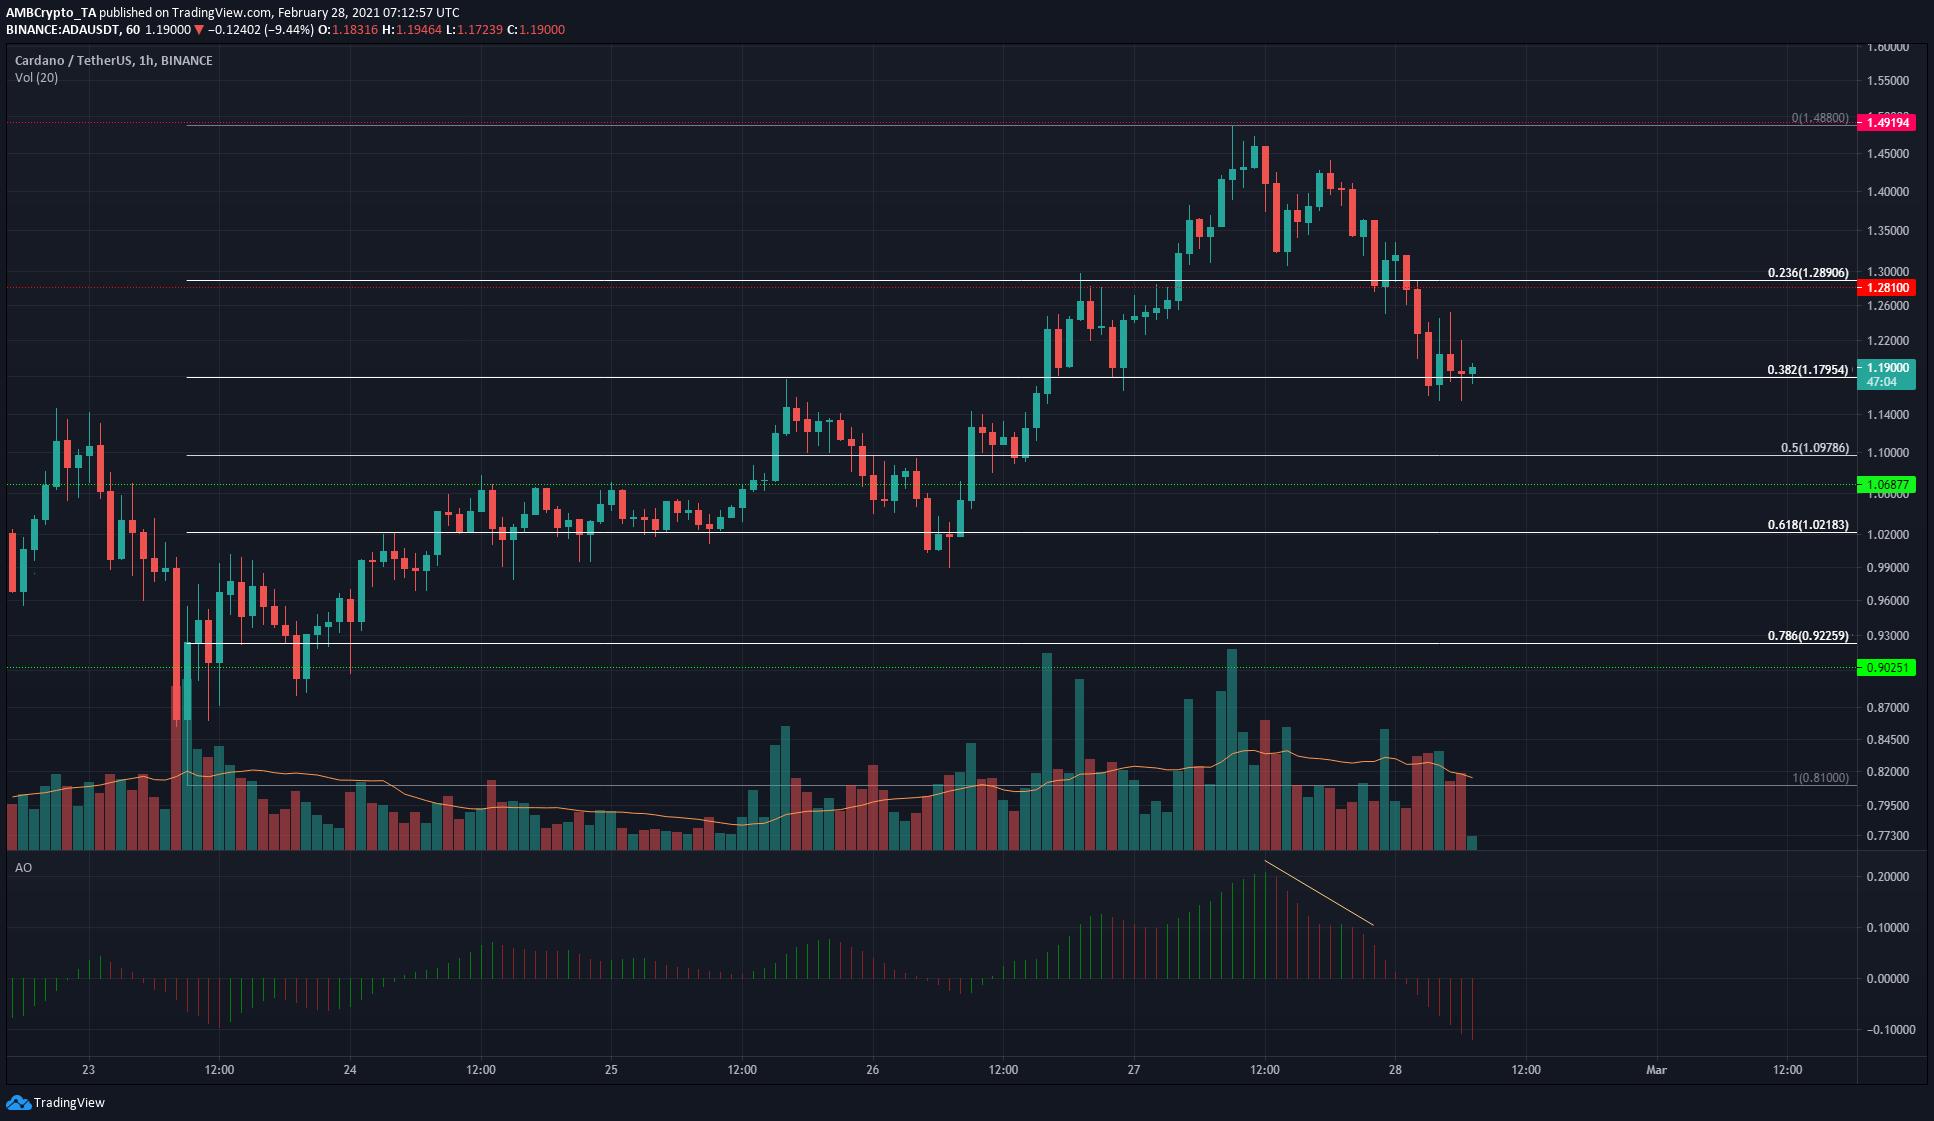 Cardano, Bitcoin SV, Dogecoin Price Analysis: 28 February